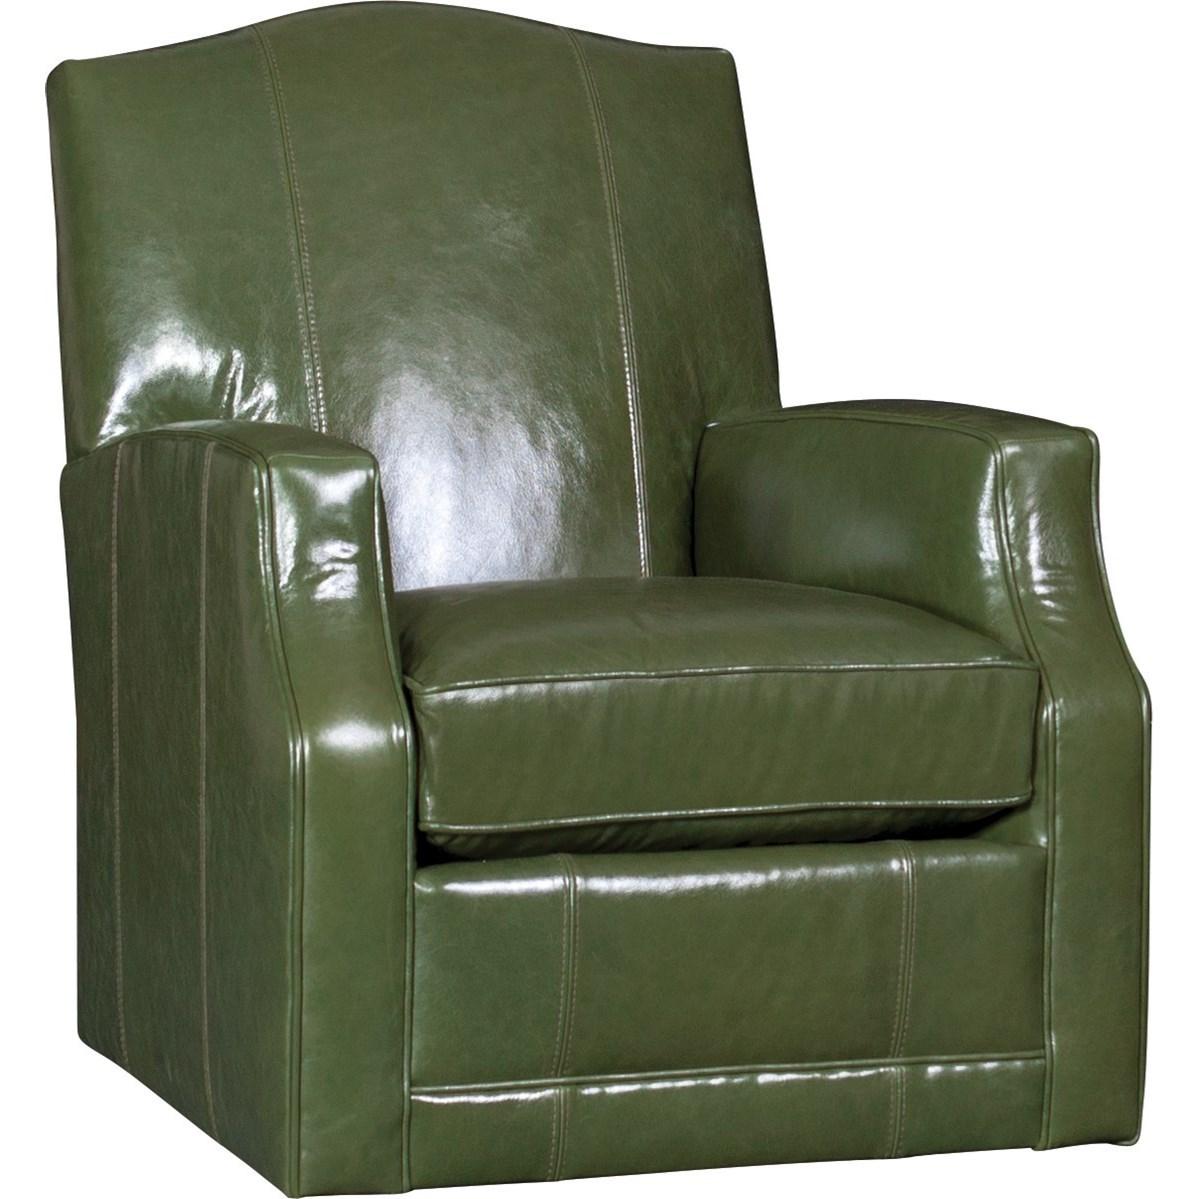 3100 Swivel Glider by Mayo at Pedigo Furniture